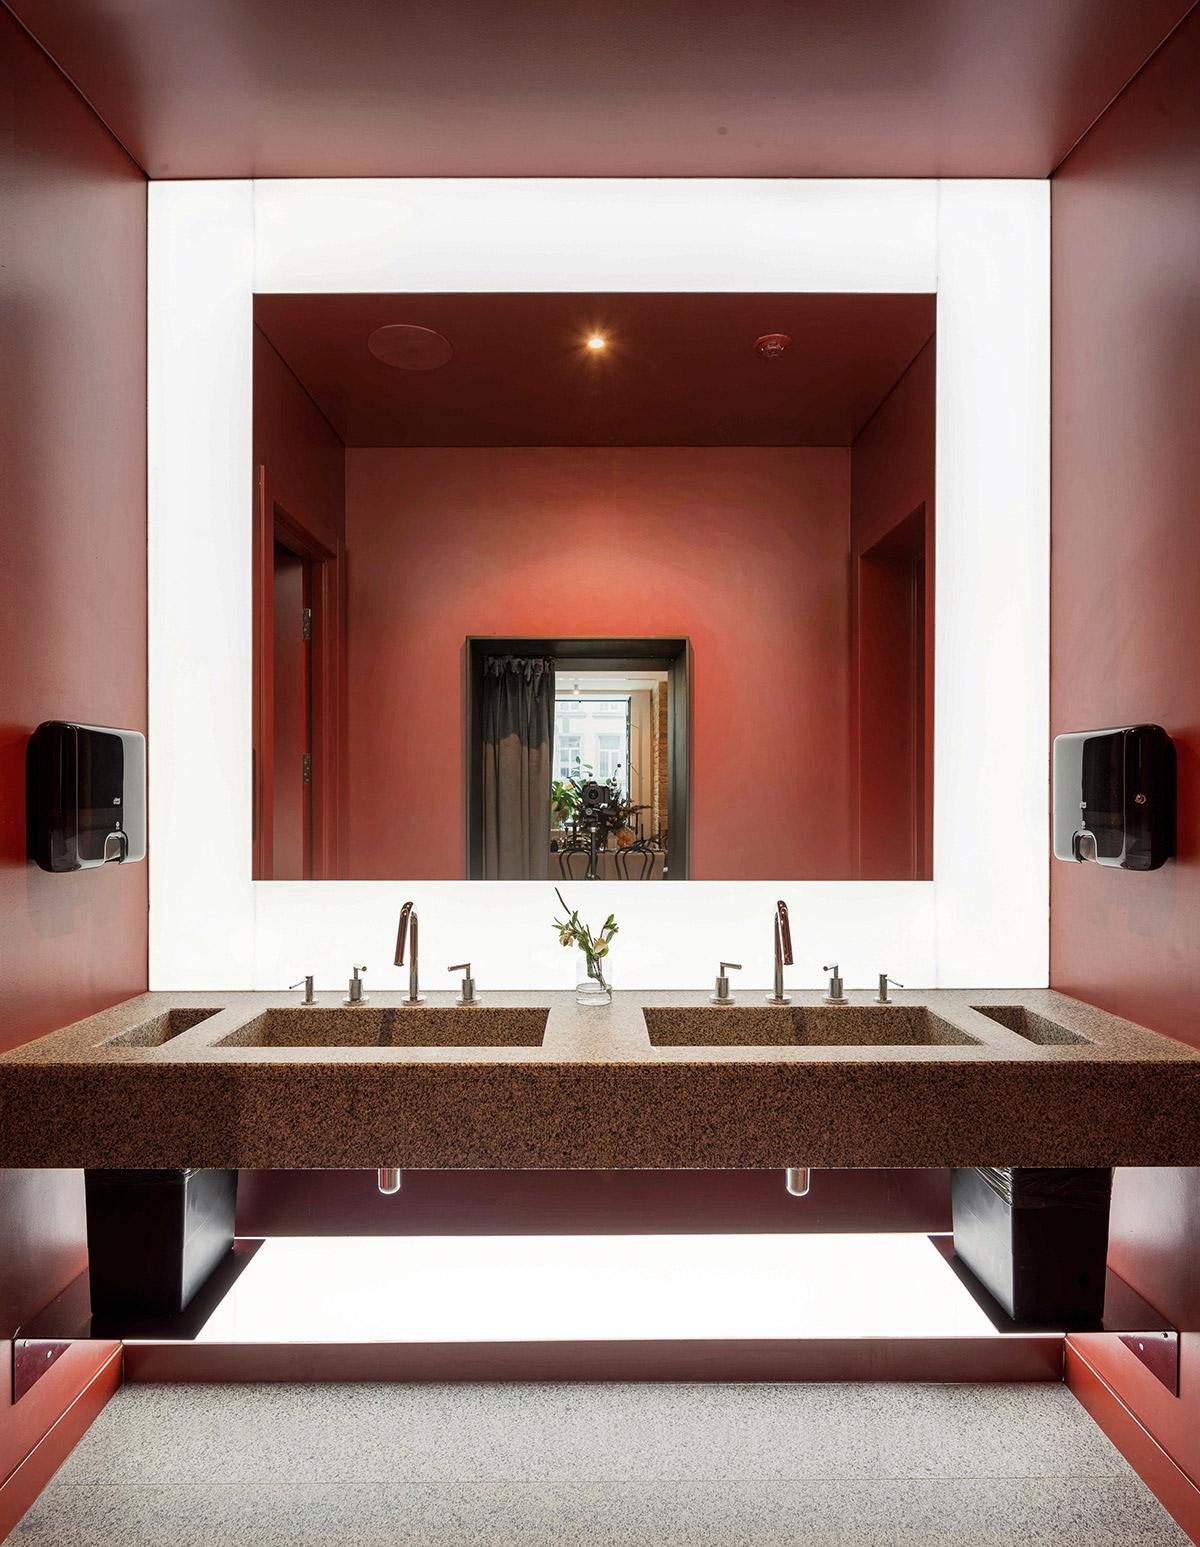 red-and-black-bathroom-ideas-600x774.jpg